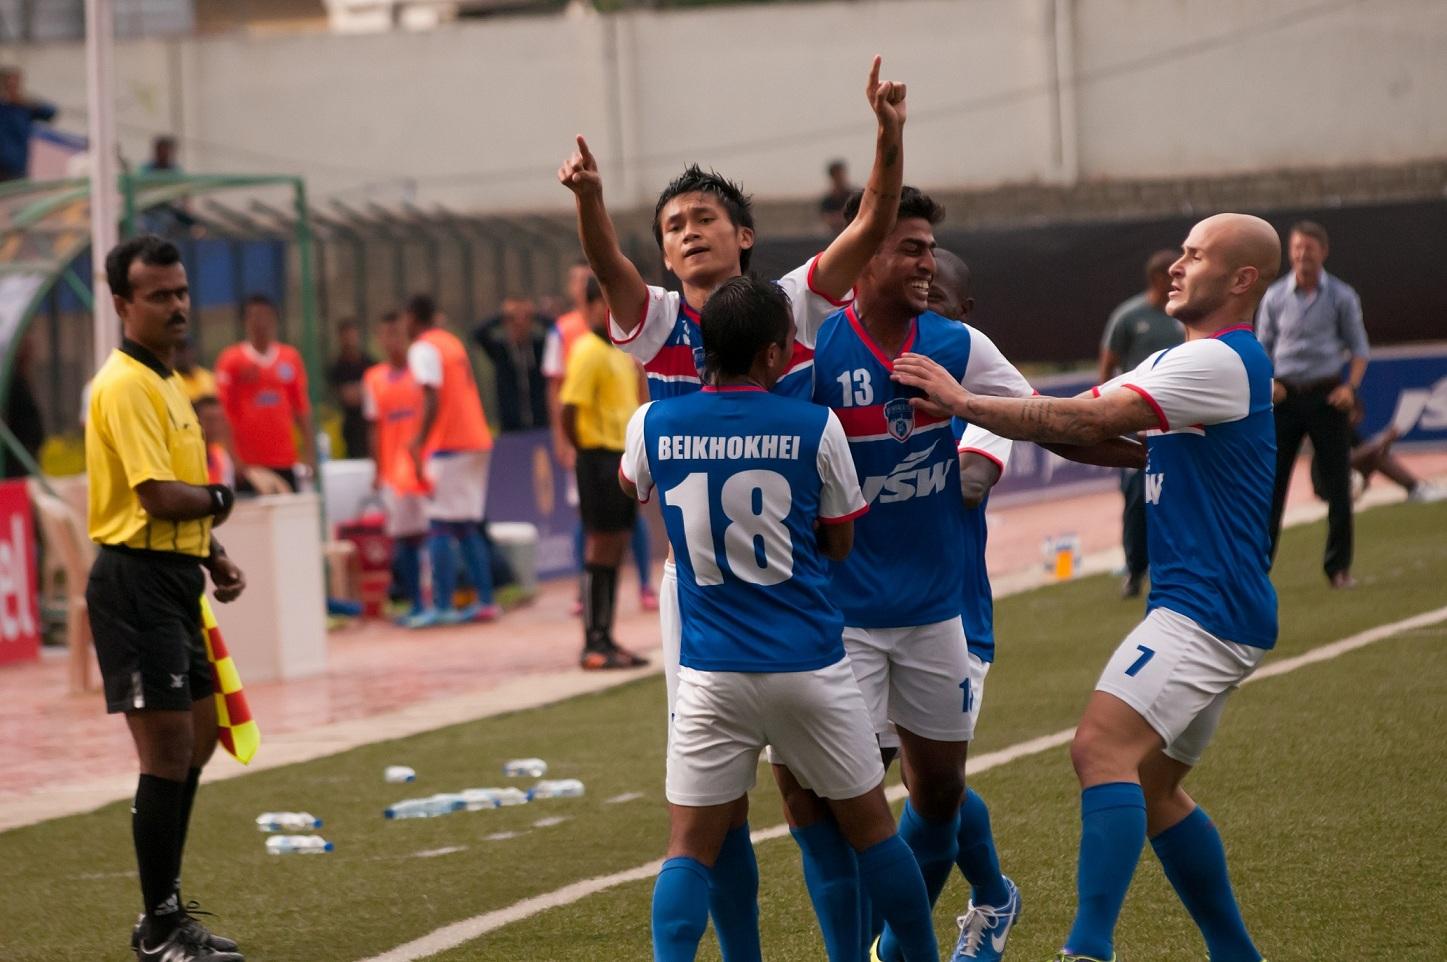 Can Bengaluru FC pass their first away test? Photo Credit: Bengaluru FC